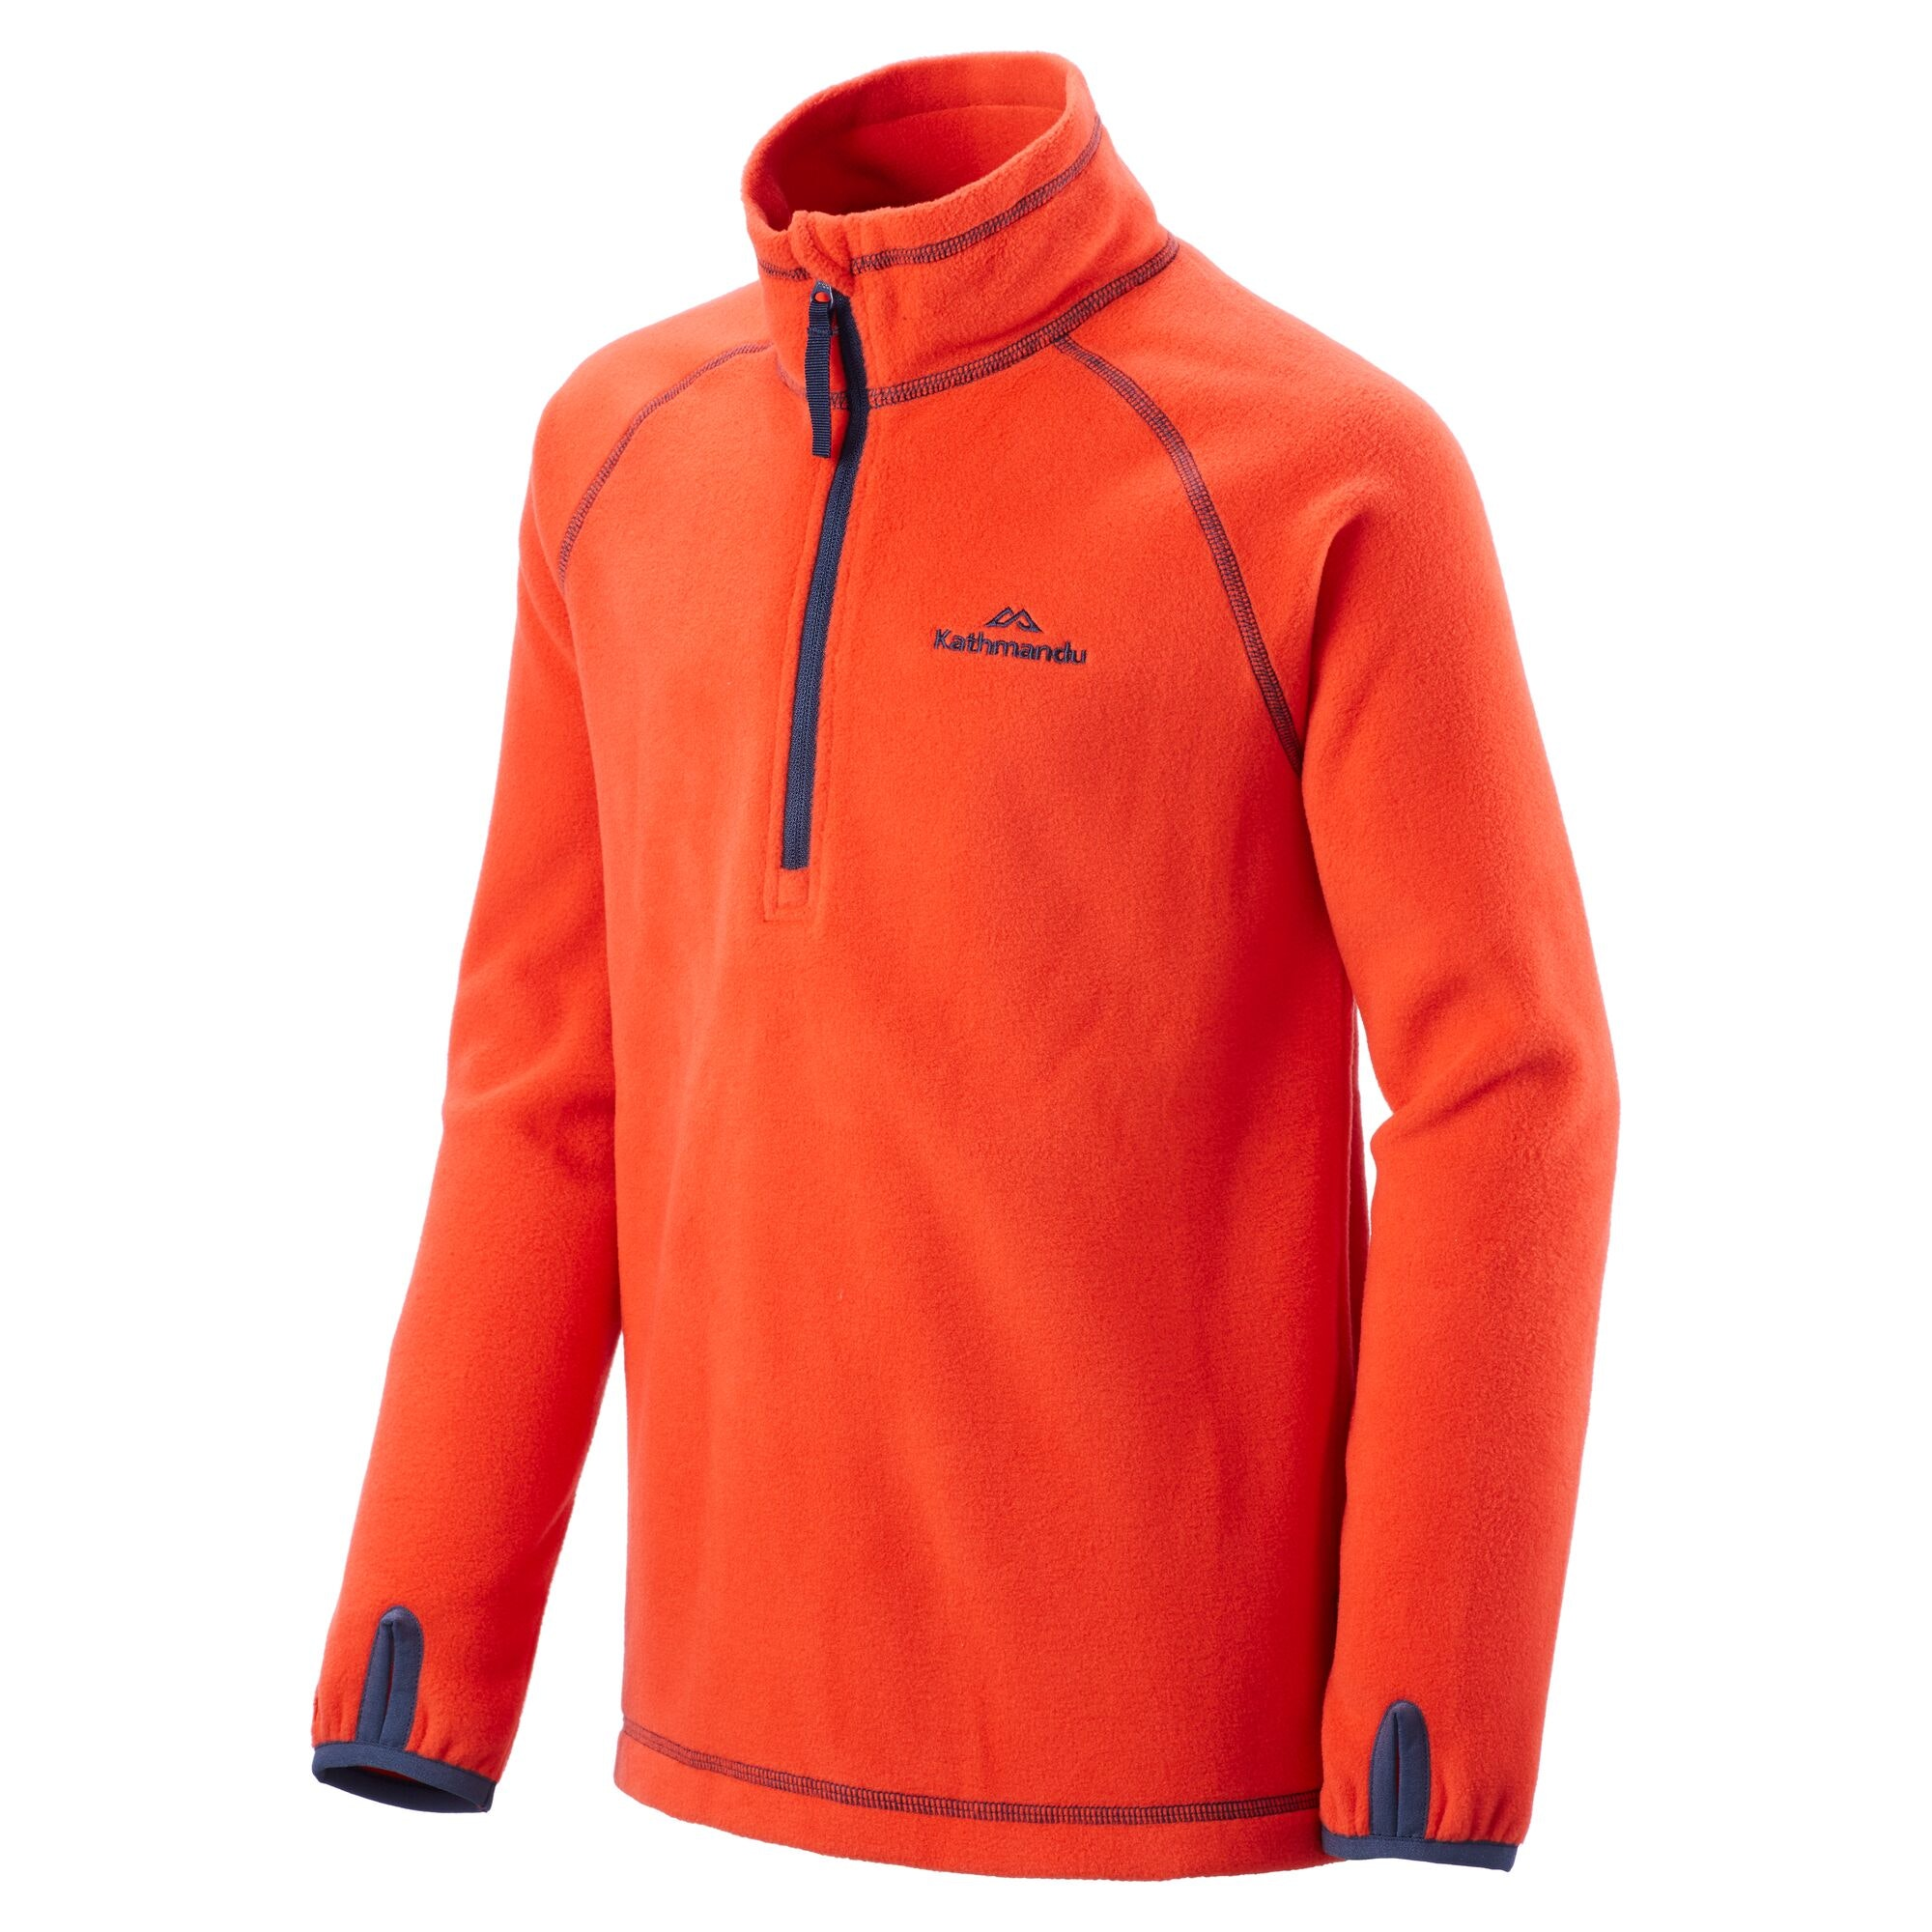 NEW-Kathmandu-Ridge-Kids-039-Girls-039-Boys-039-Warm-Fleece-Jacket-1-4-Zip-Pullover-Top thumbnail 31